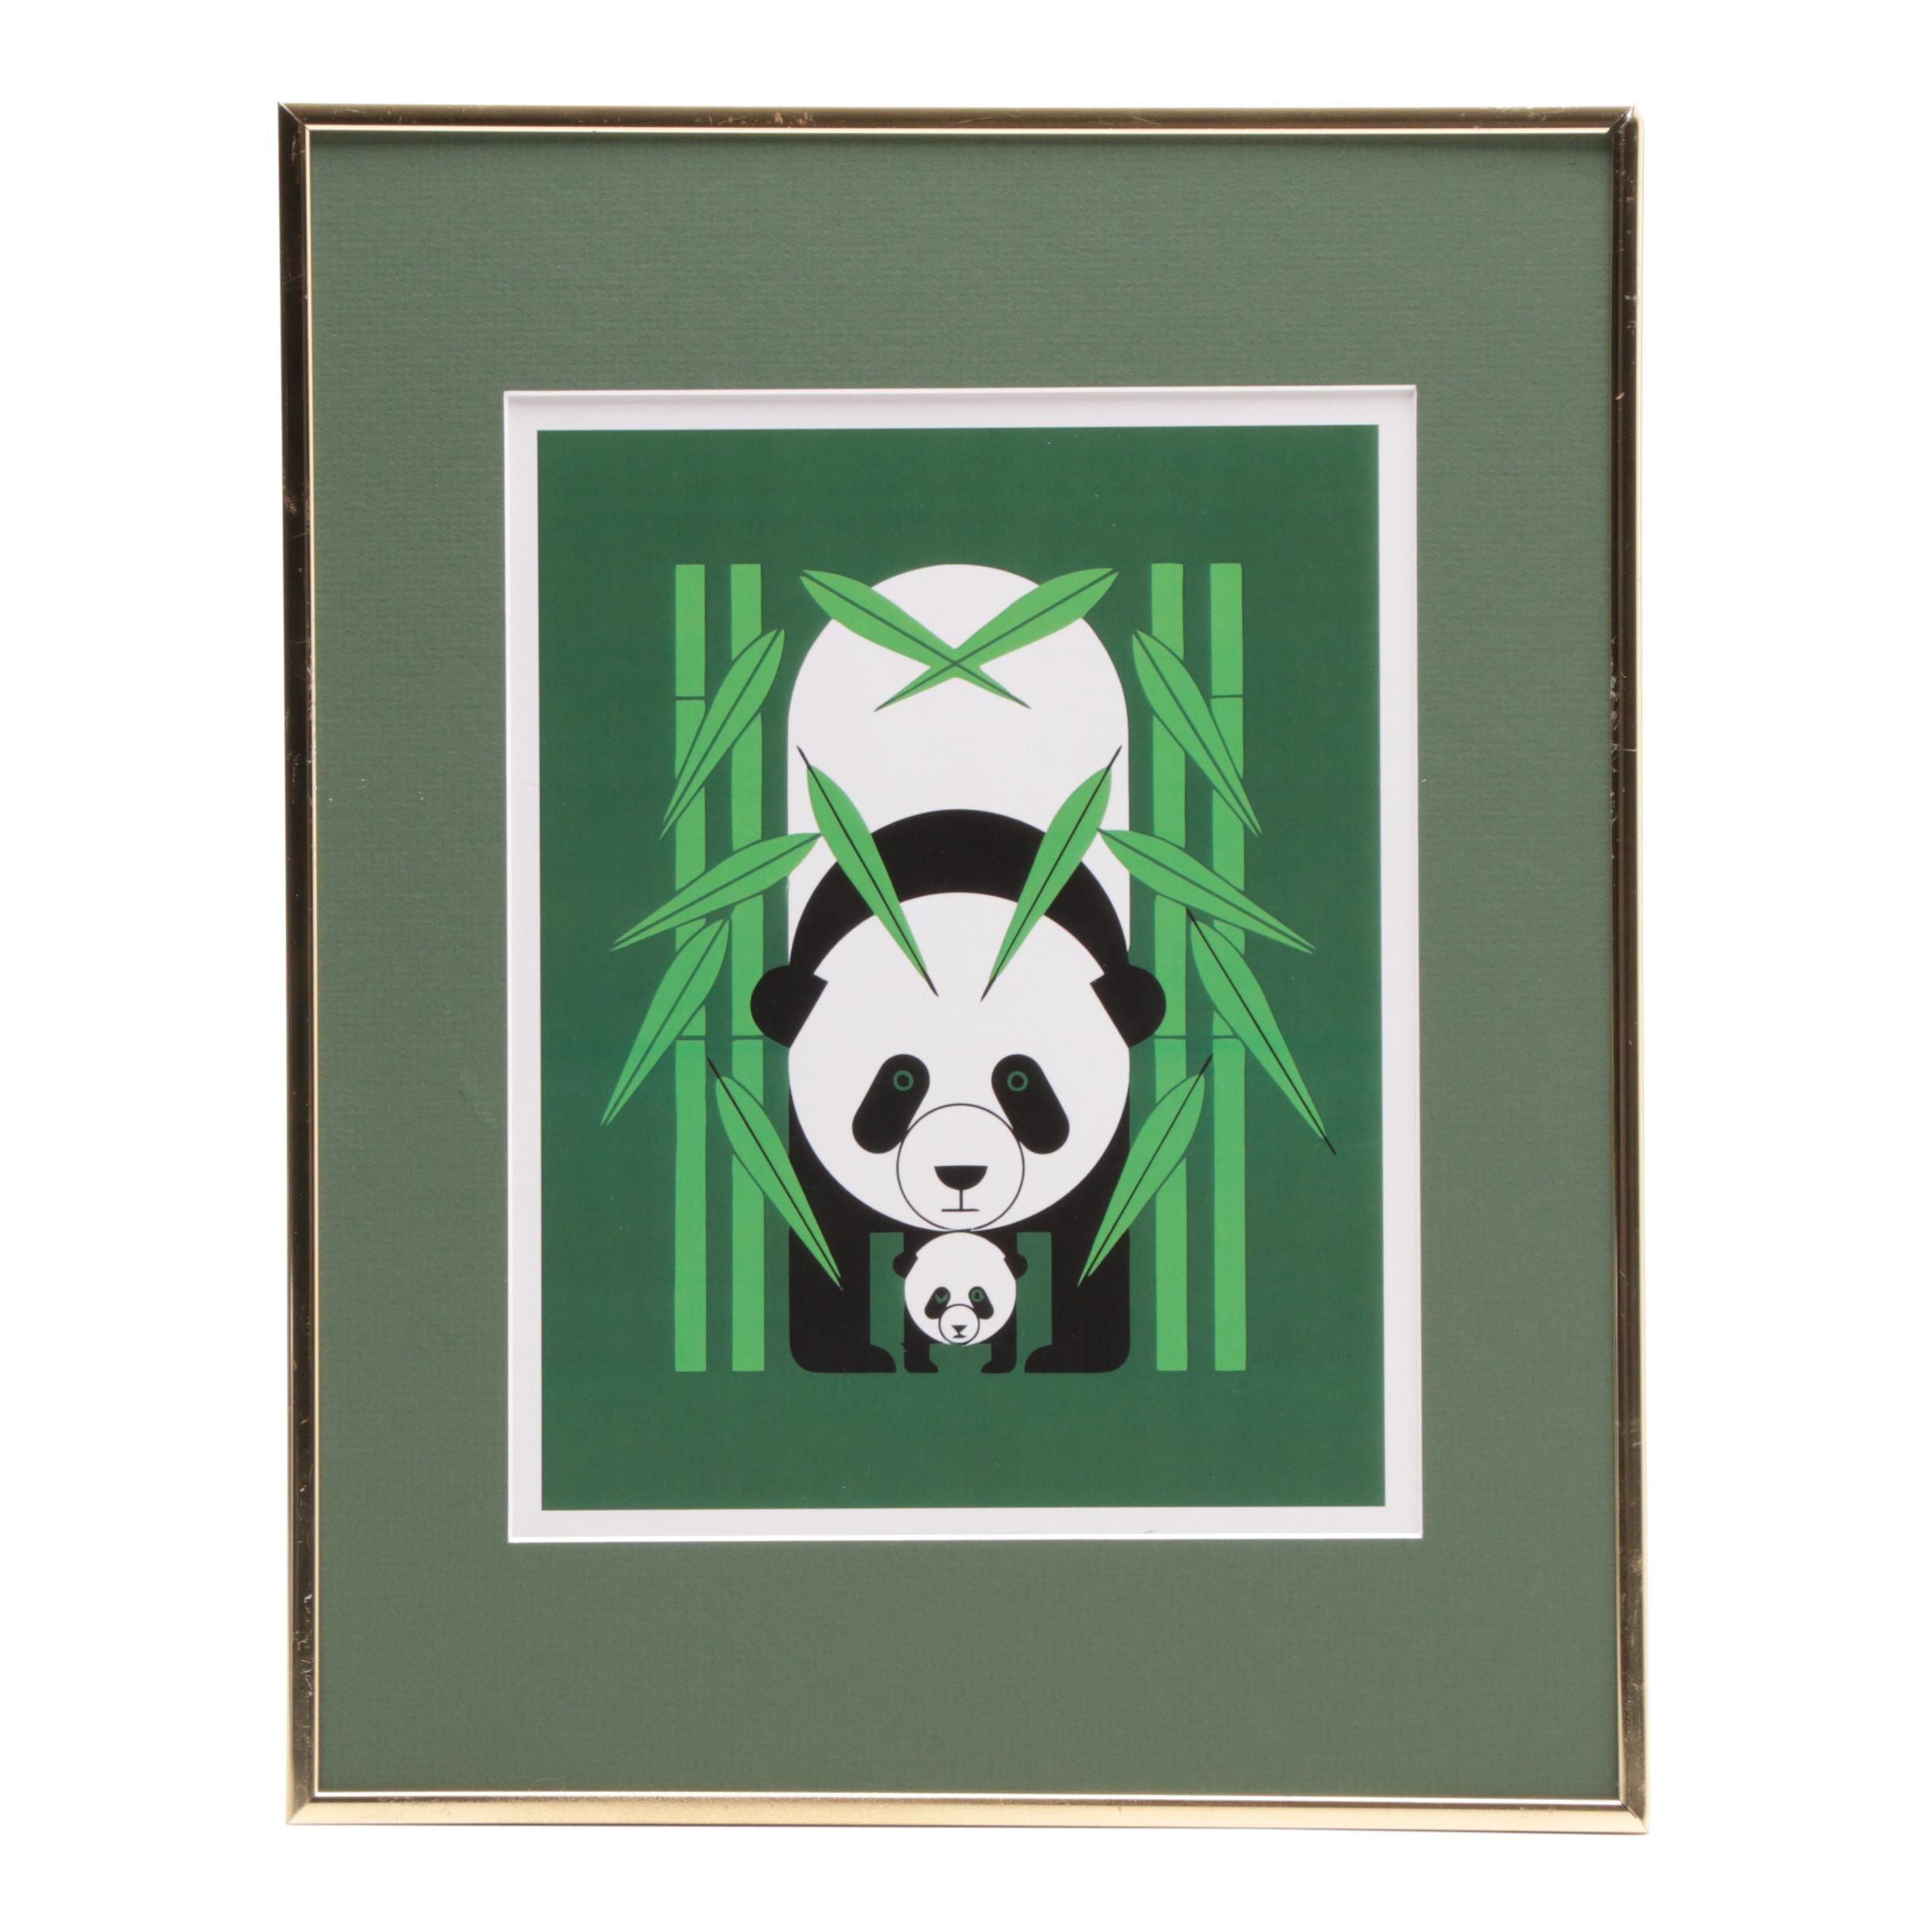 "Offset Lithograph after Charley Harper ""Panda Panda"""